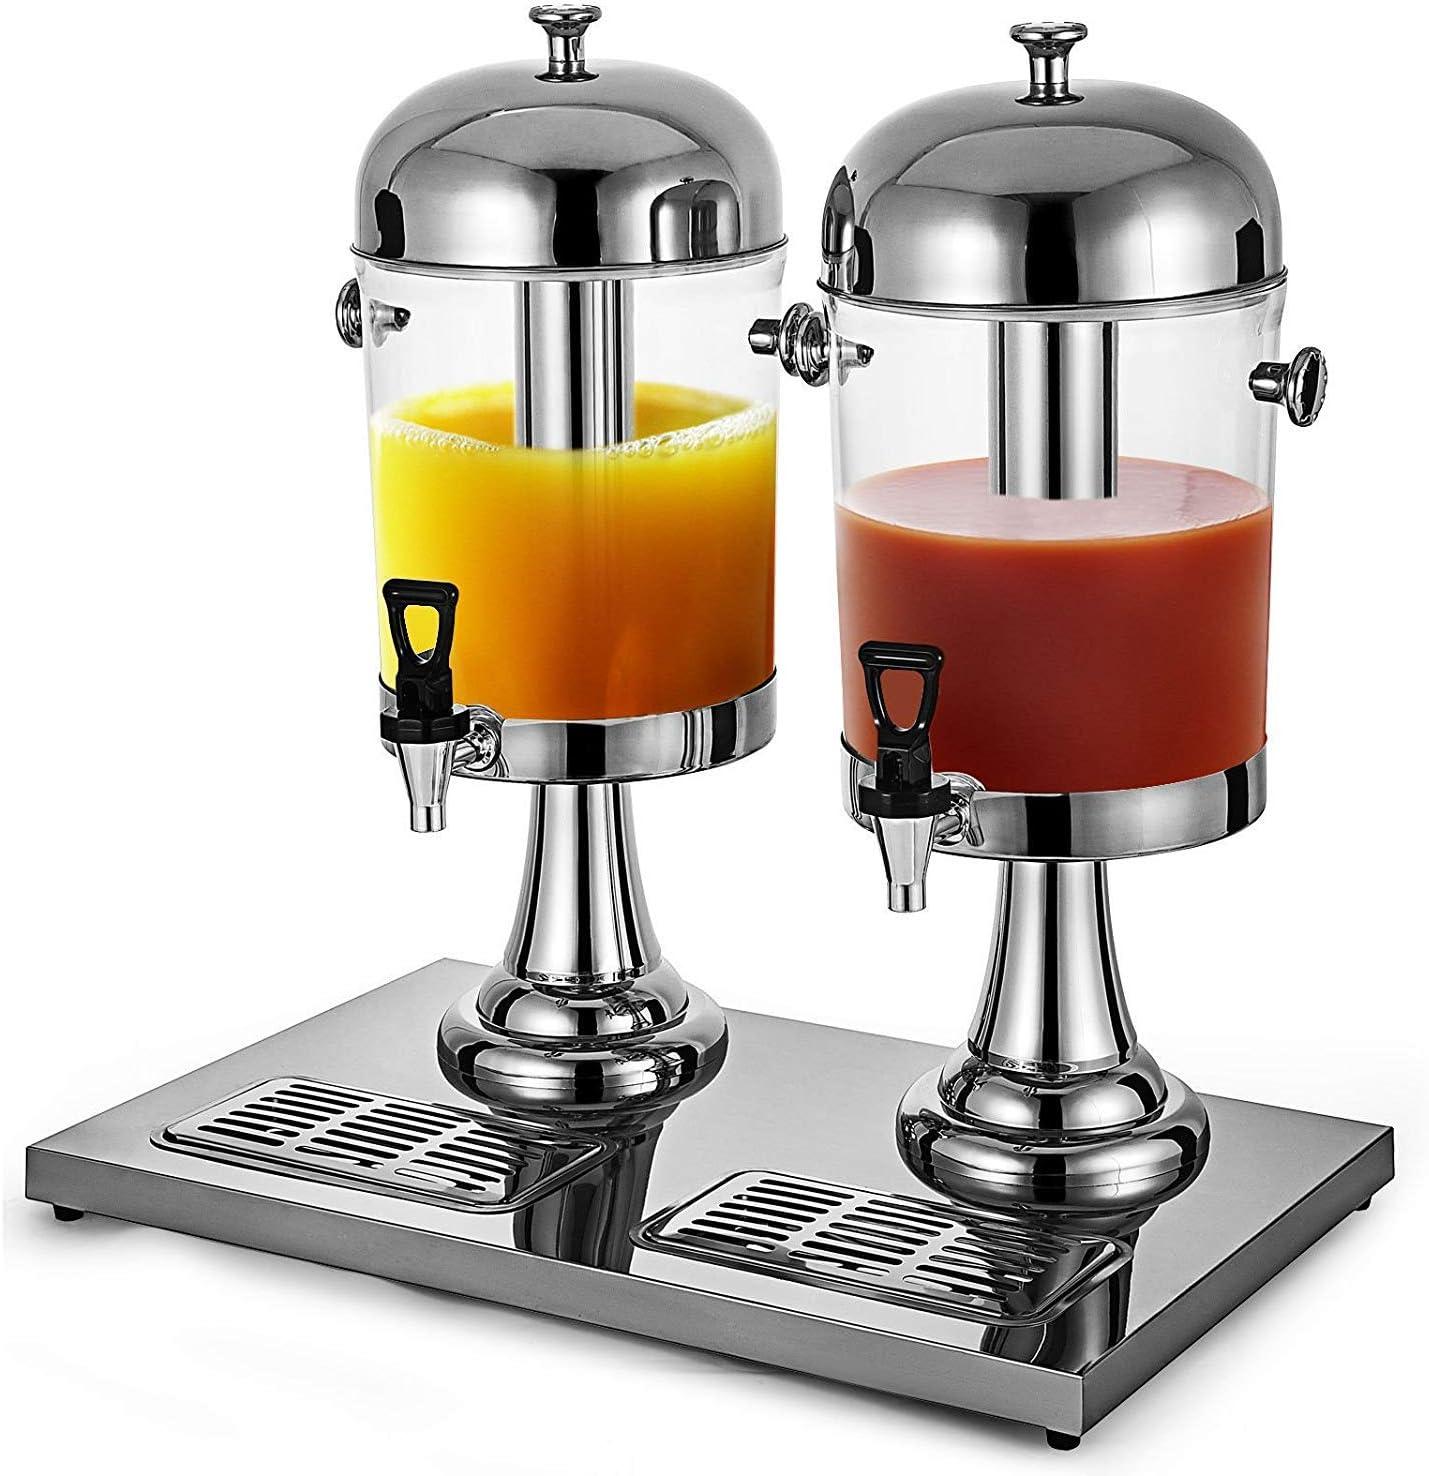 VEVOR 16L/4.2 Gallon Milk Cold Parties Restaurants Hotels Buffets, Juice Drink Dispenser